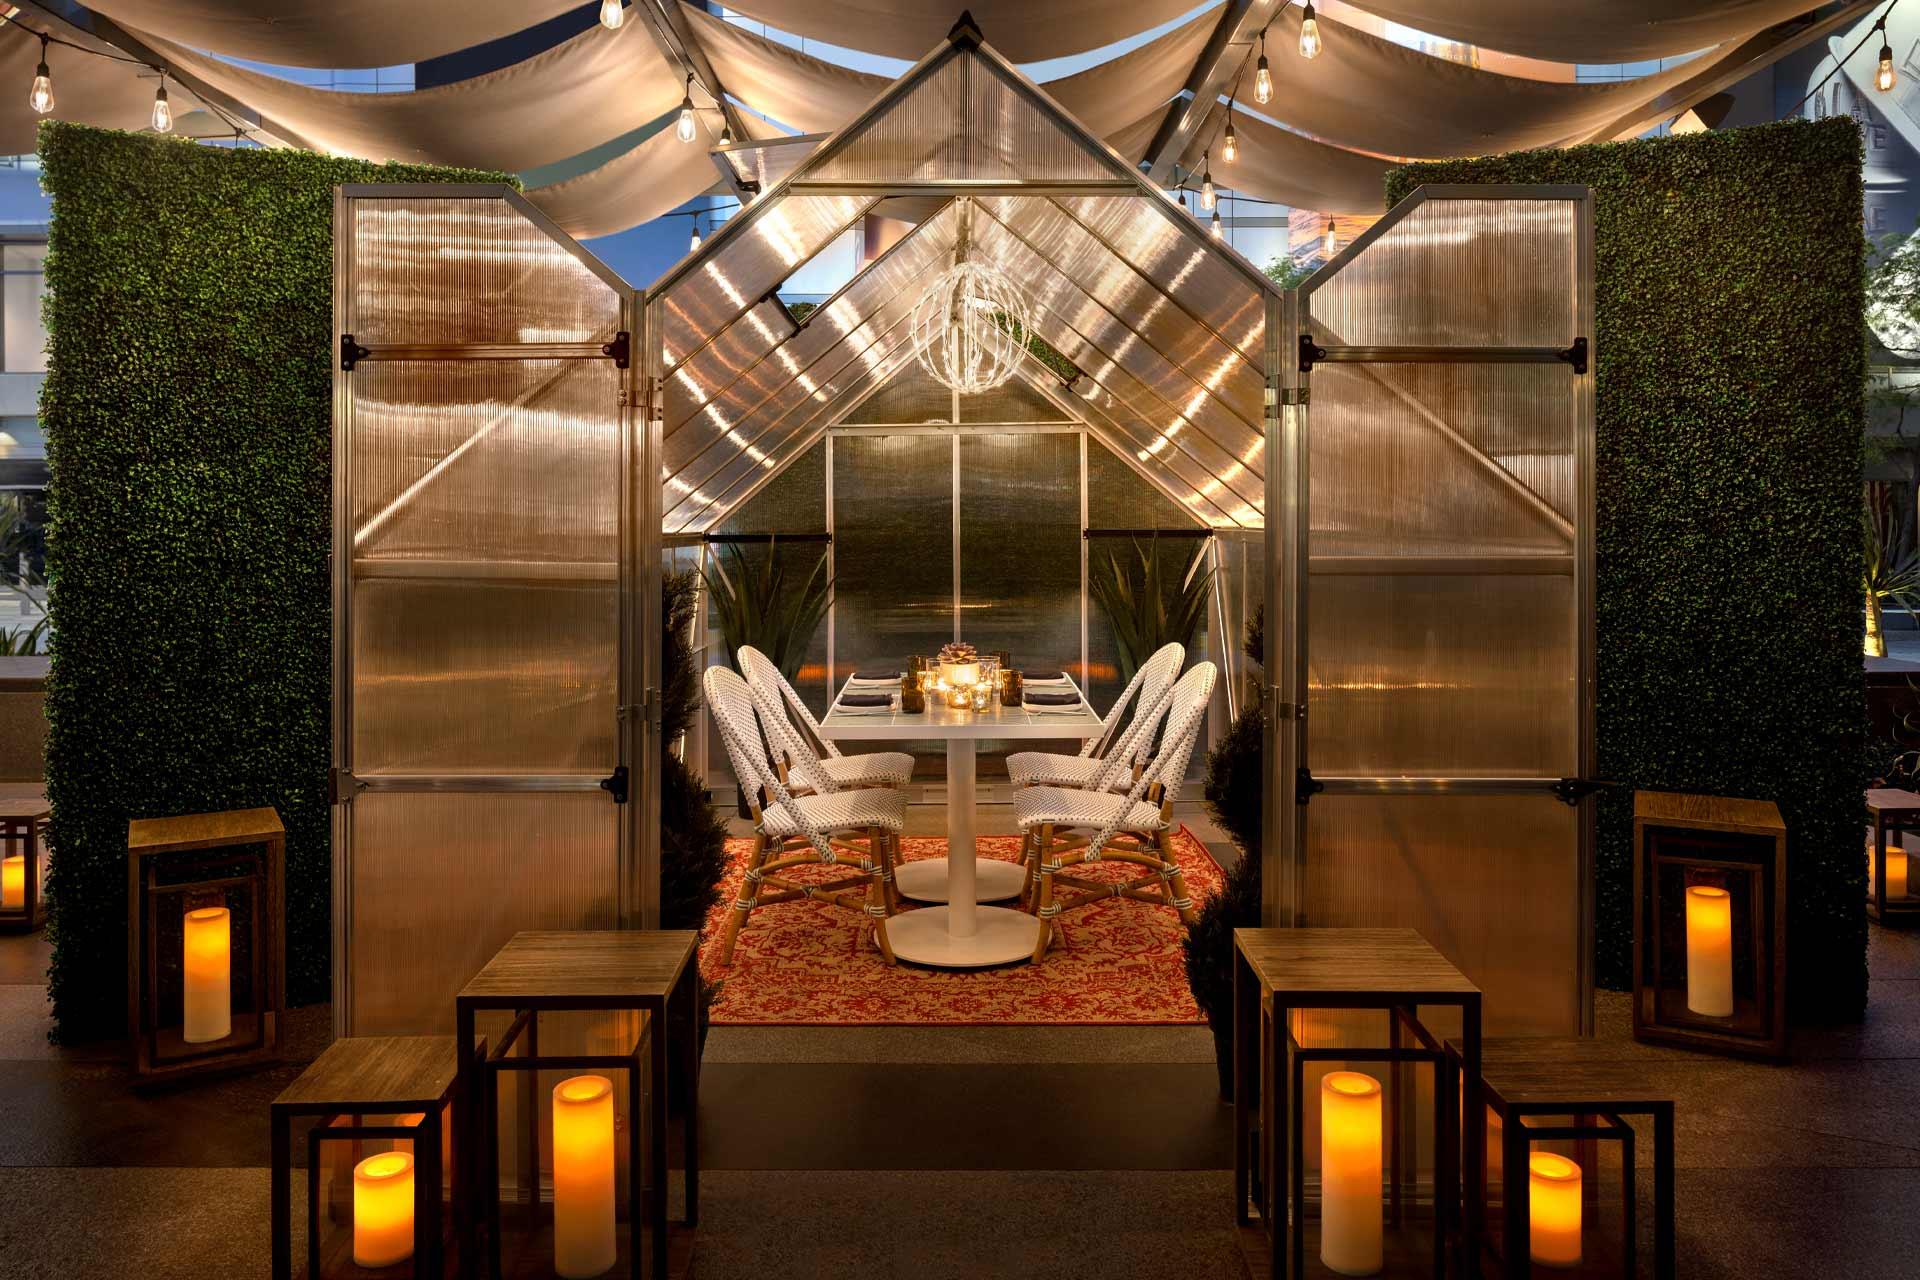 Savoca restaurant at JW Marriott Los Angeles LA Live